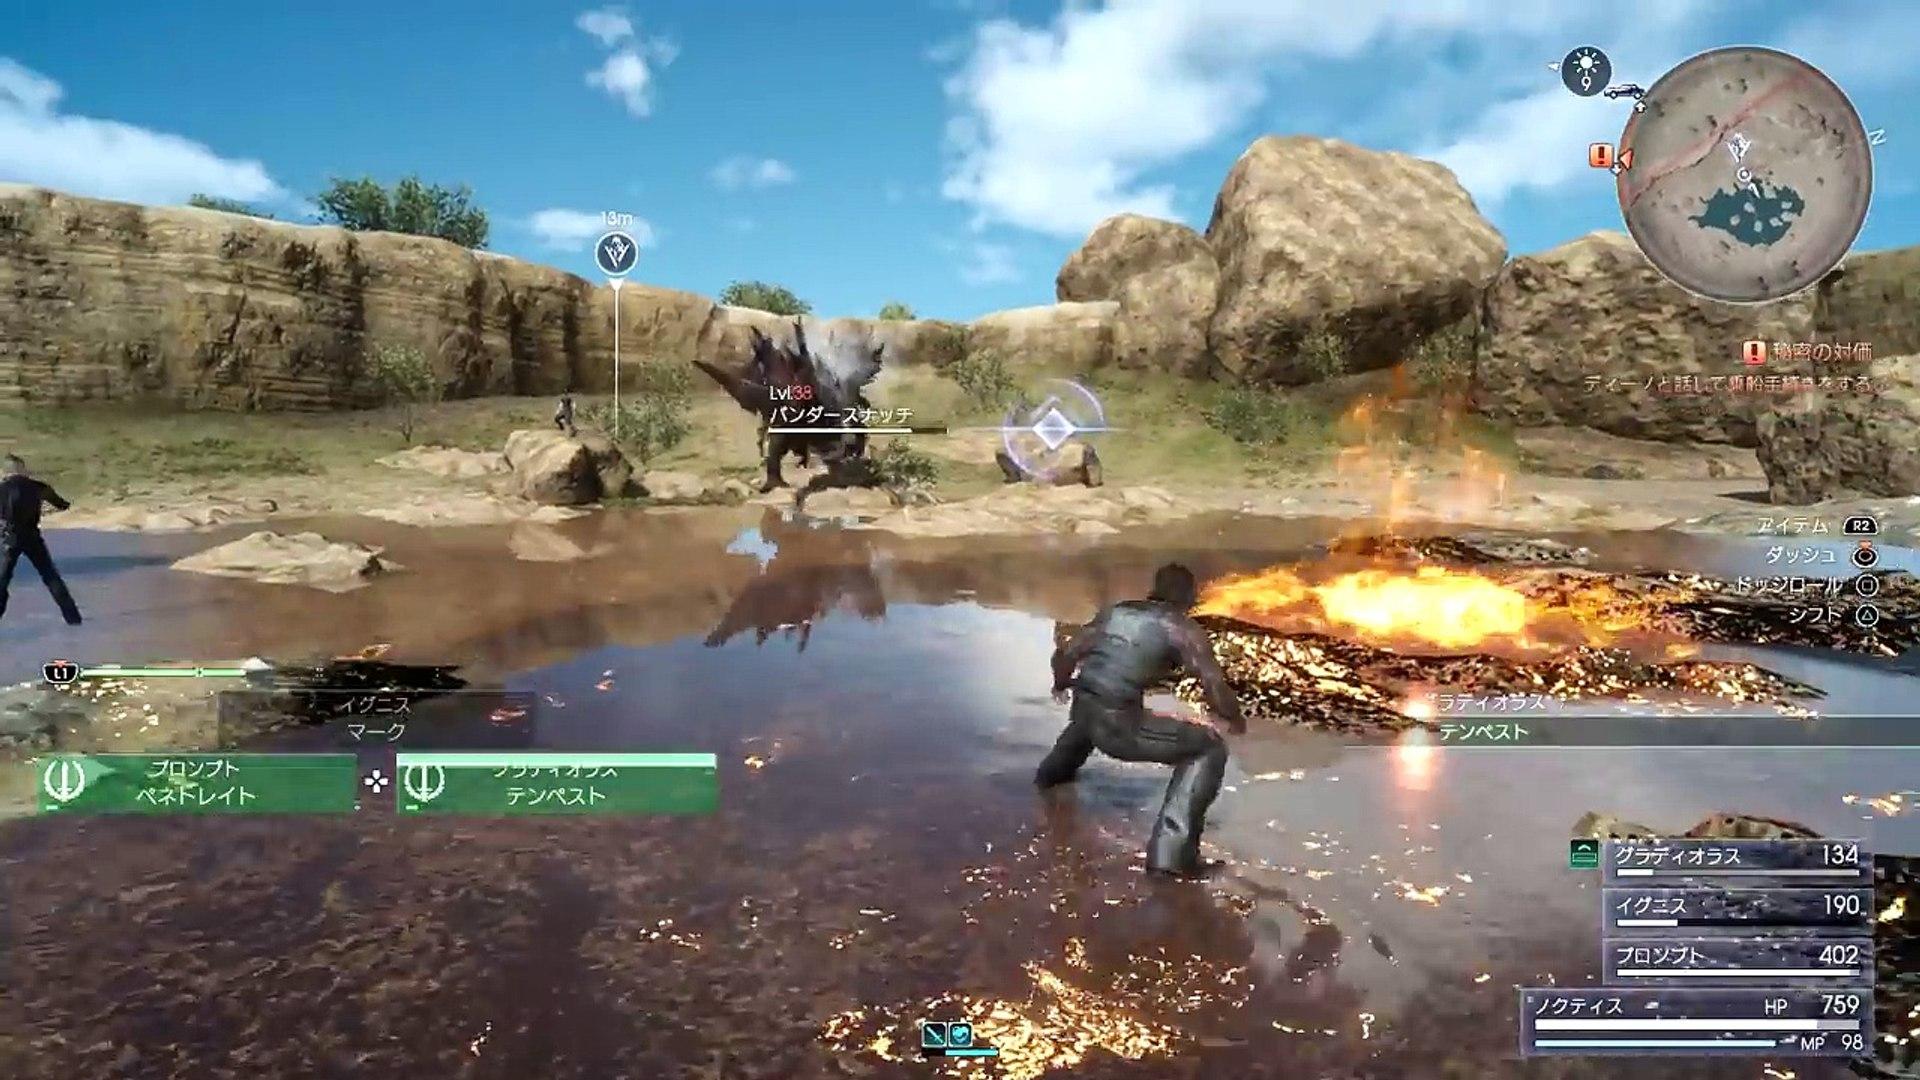 FINAL FANTASY XV - Bandersnatch Boss Fight l Level 10 Vs. Level 38 Boss